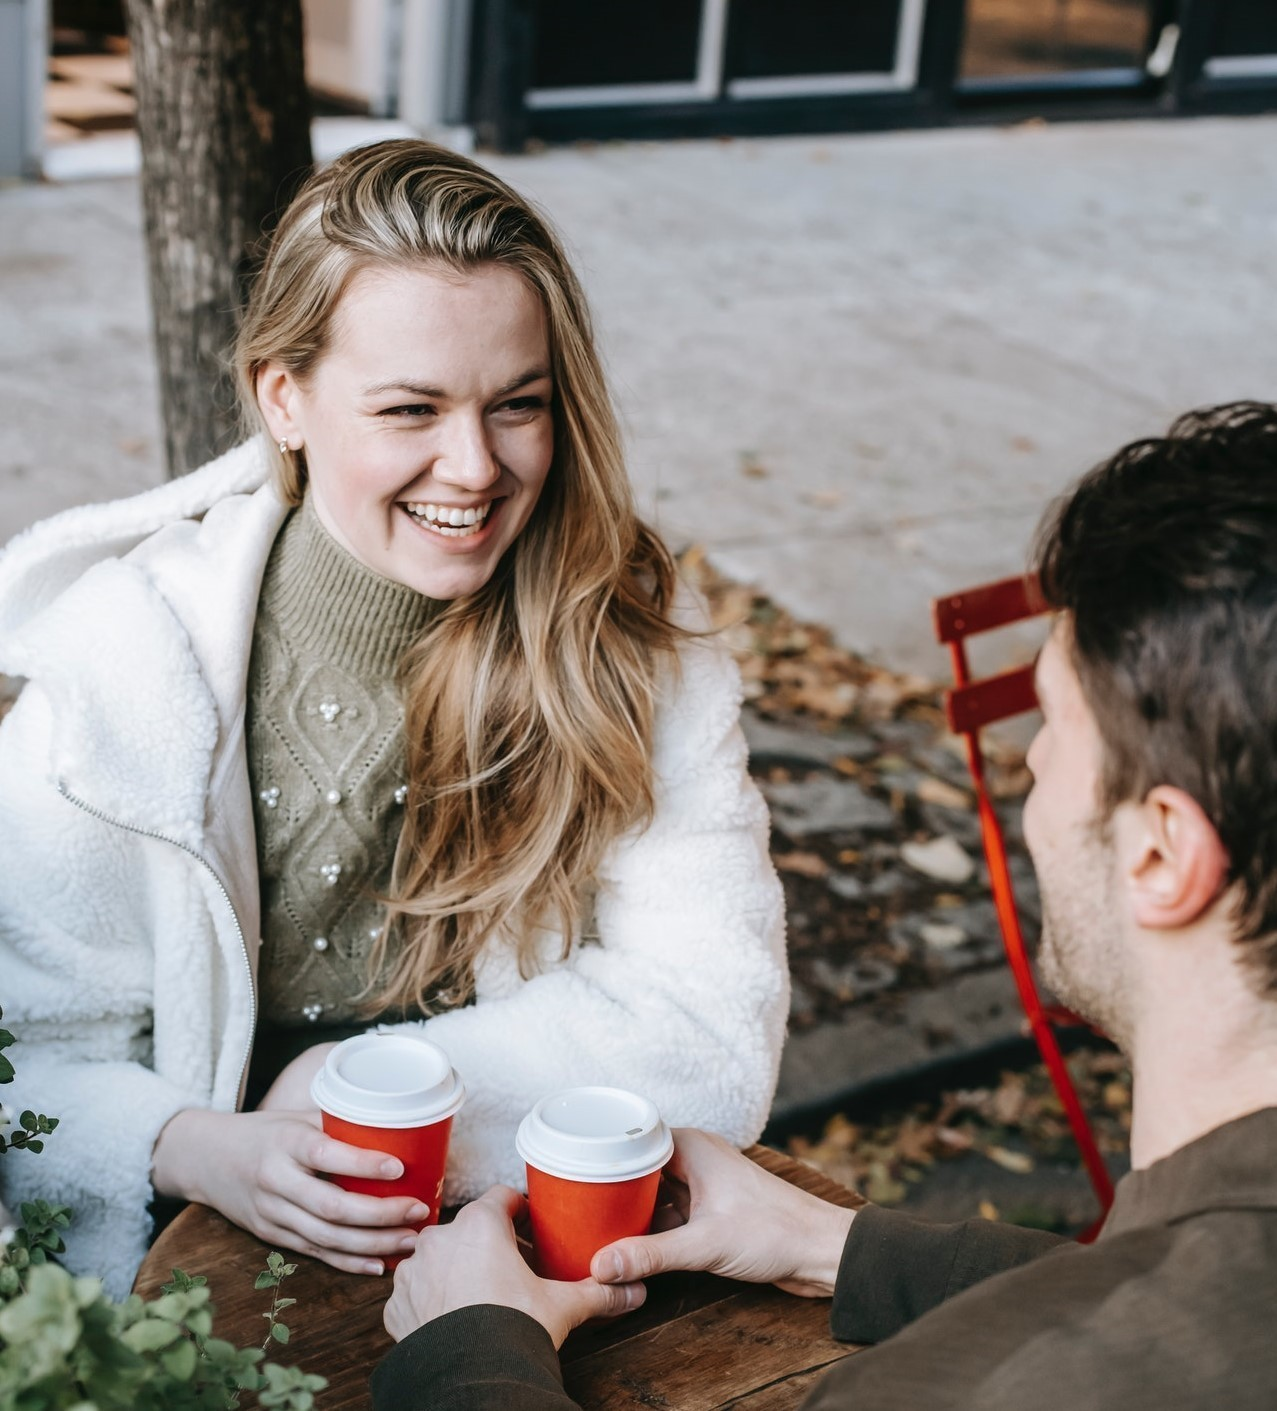 4 Subtle Lies Men Tell Women, According to Psychologist